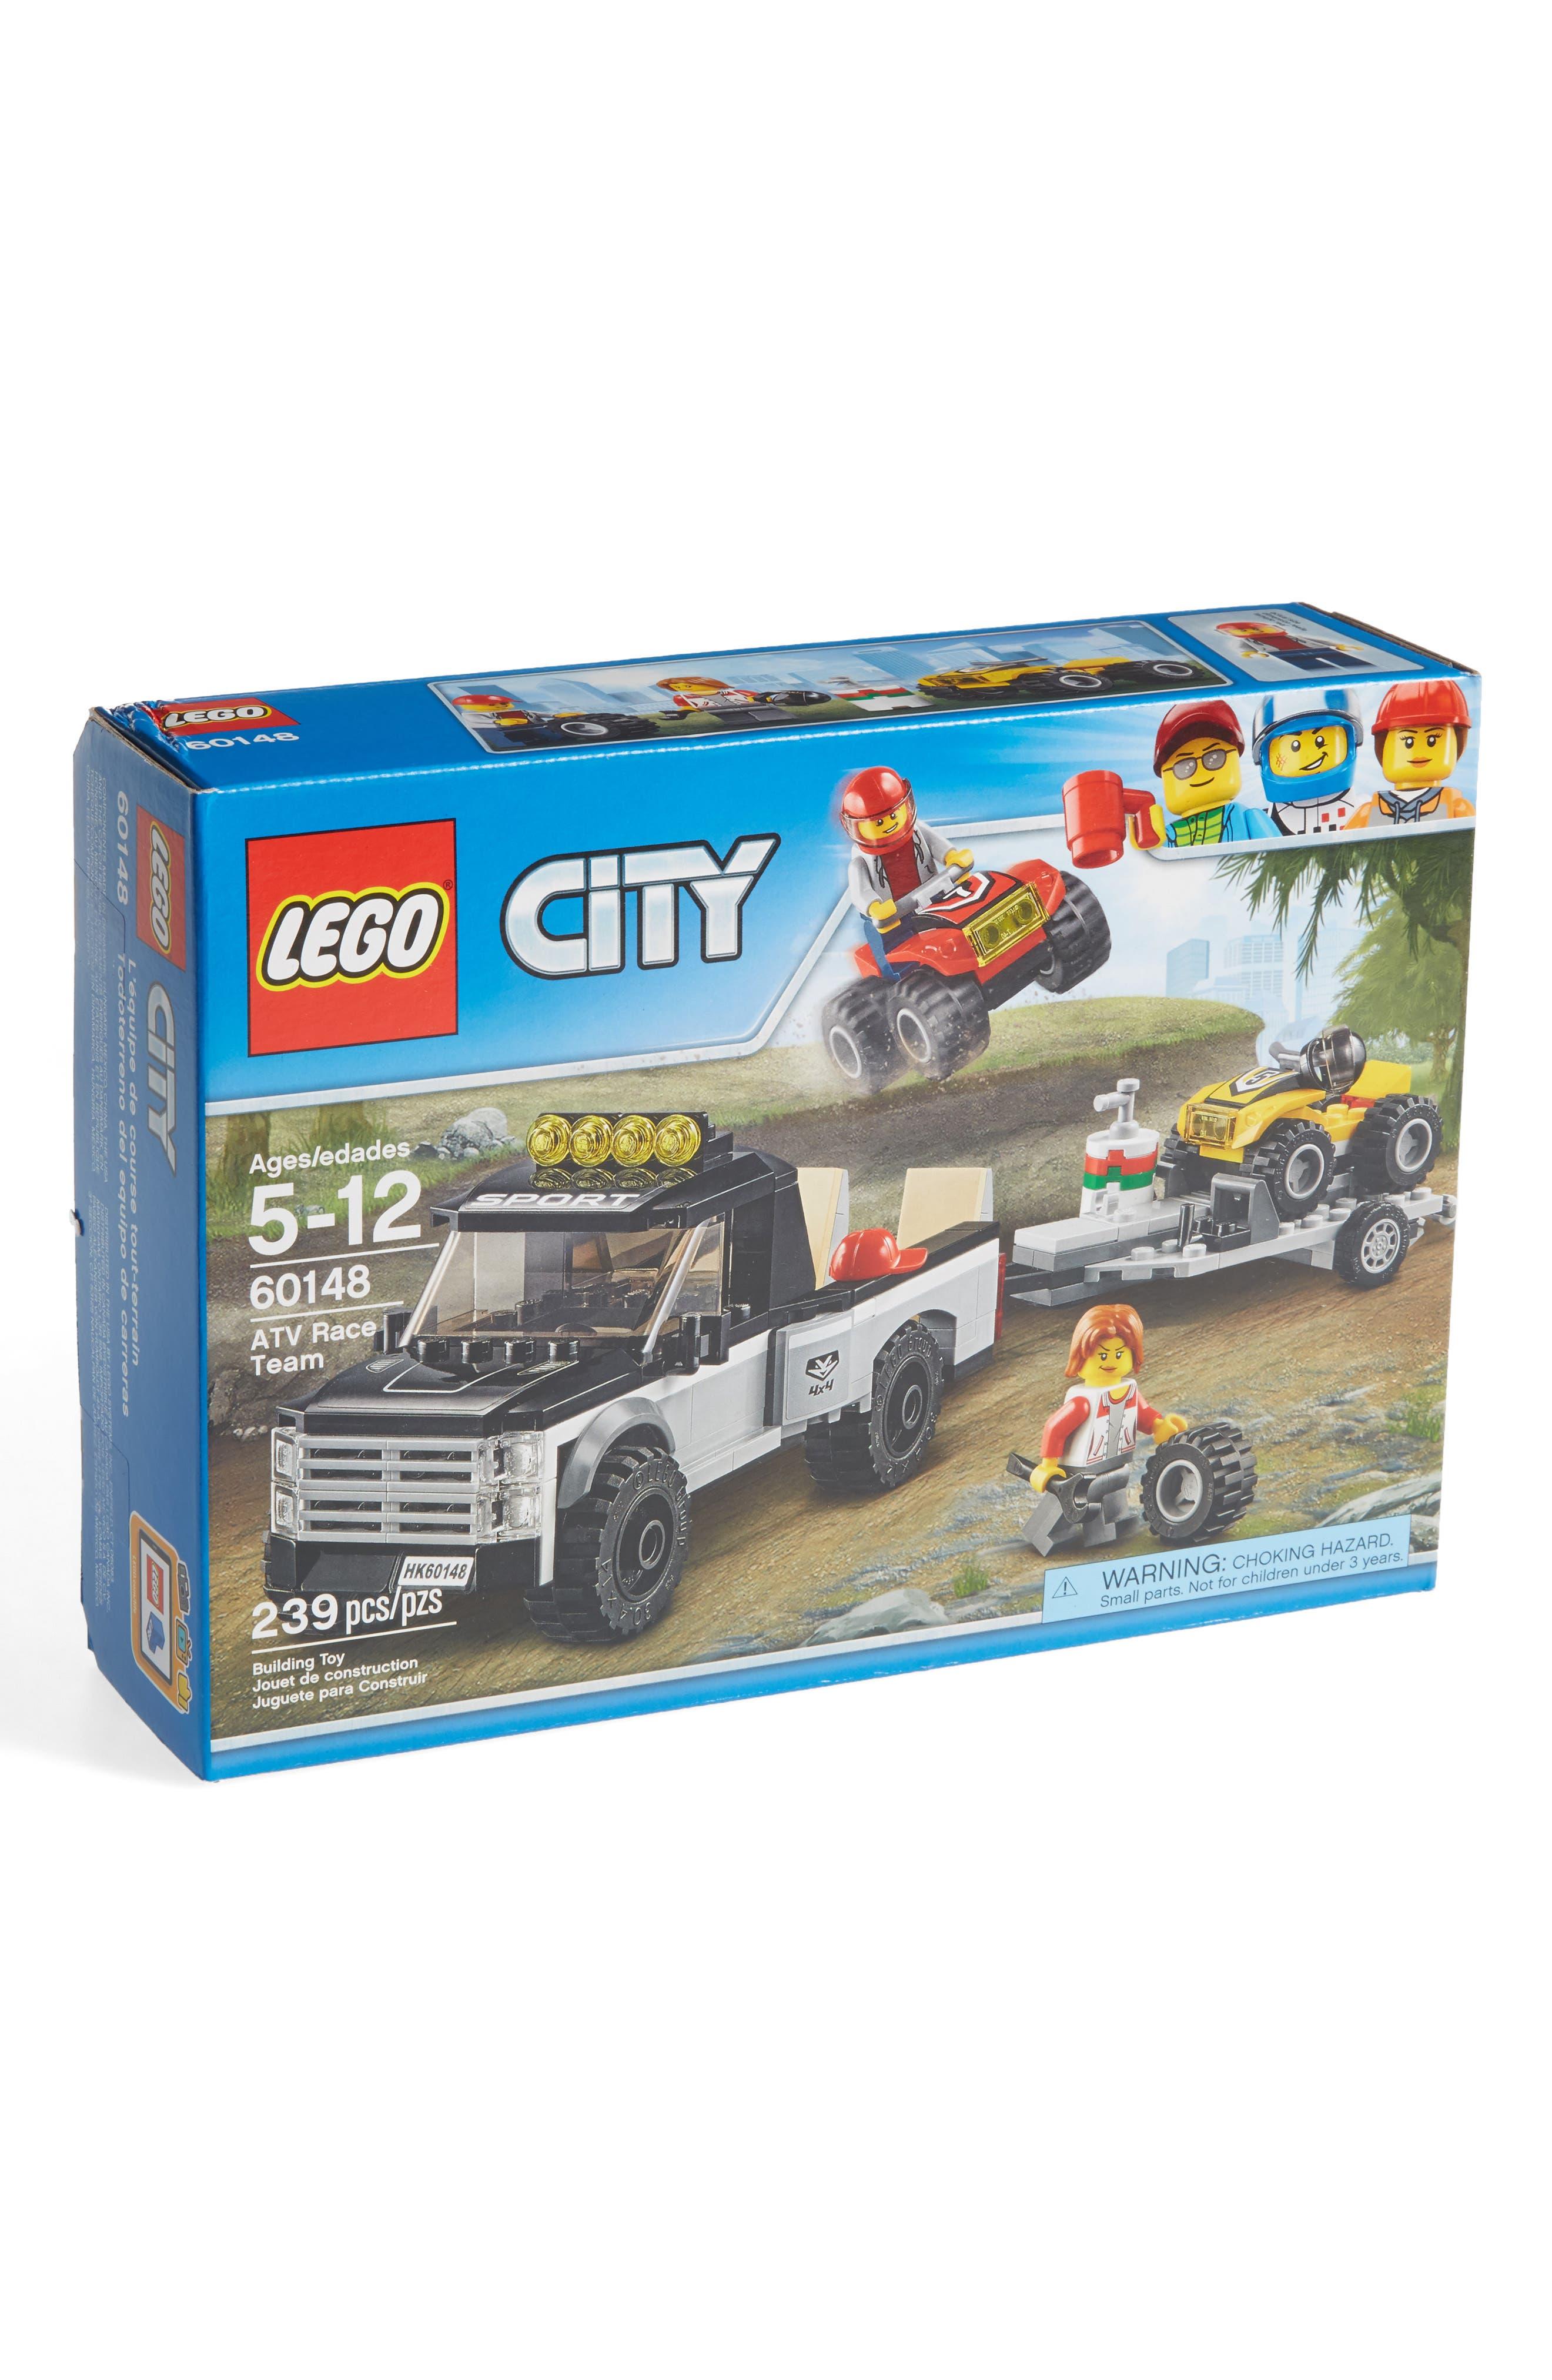 City ATV Race Team - 60148,                         Main,                         color, 400